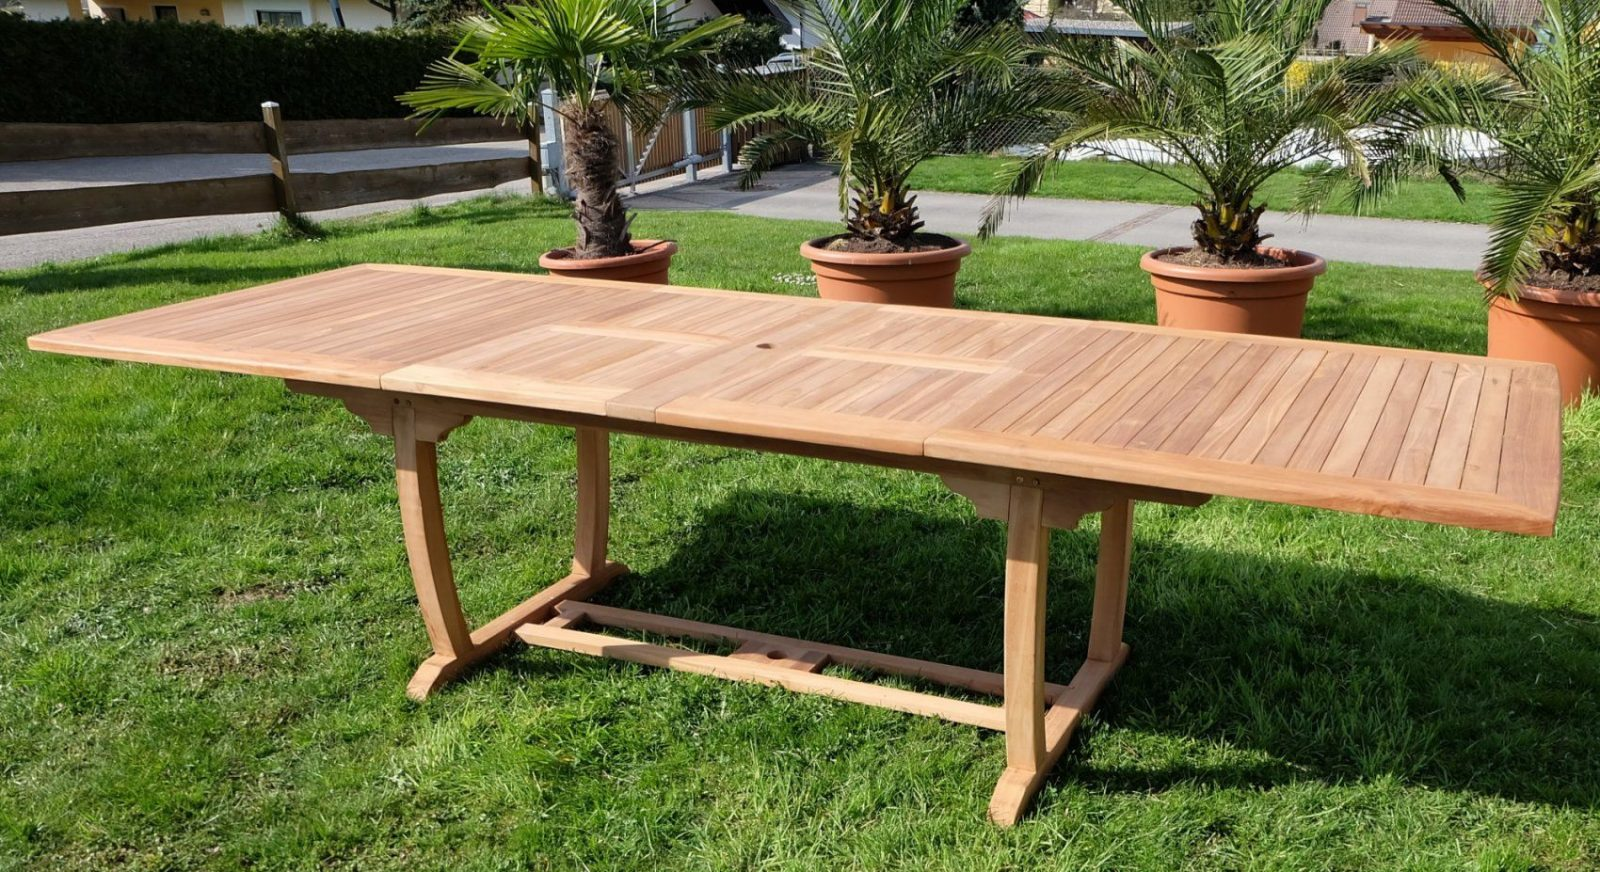 Gartentisch Holz Ausziehbar Gartentisch Holz Ikea Ausziehbar